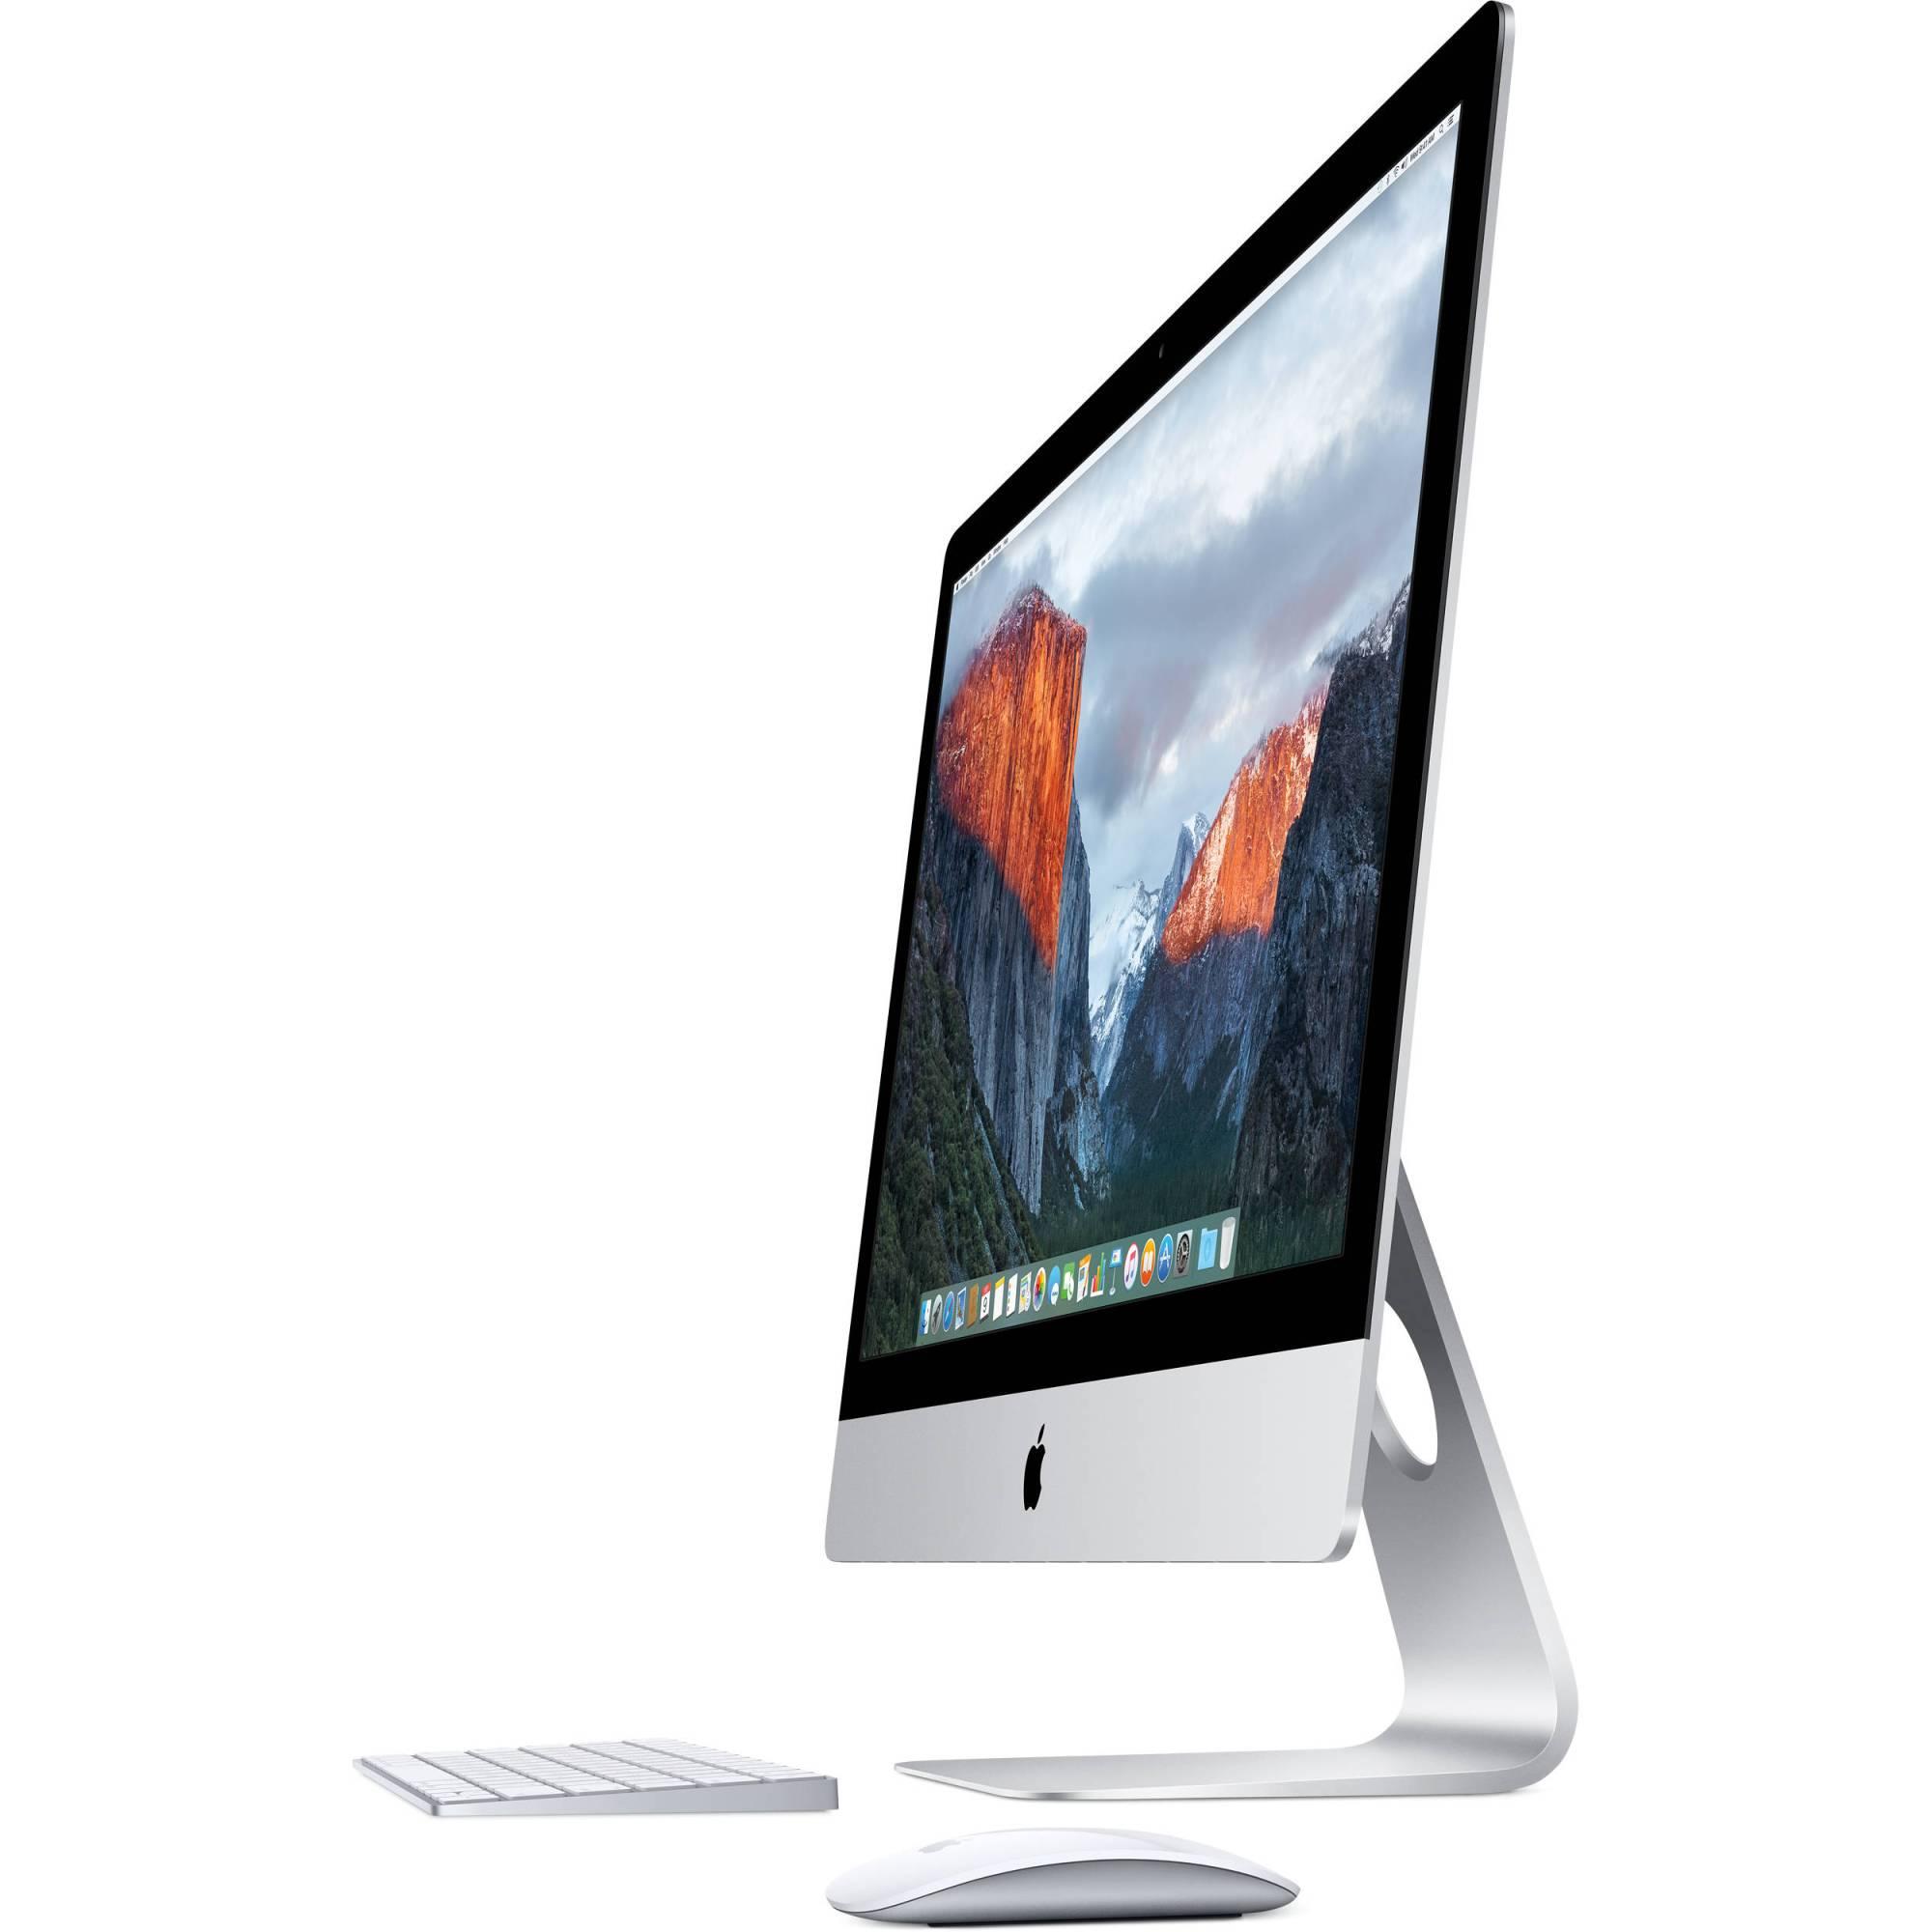 hight resolution of apple 27 imac with retina 5k display late 2015